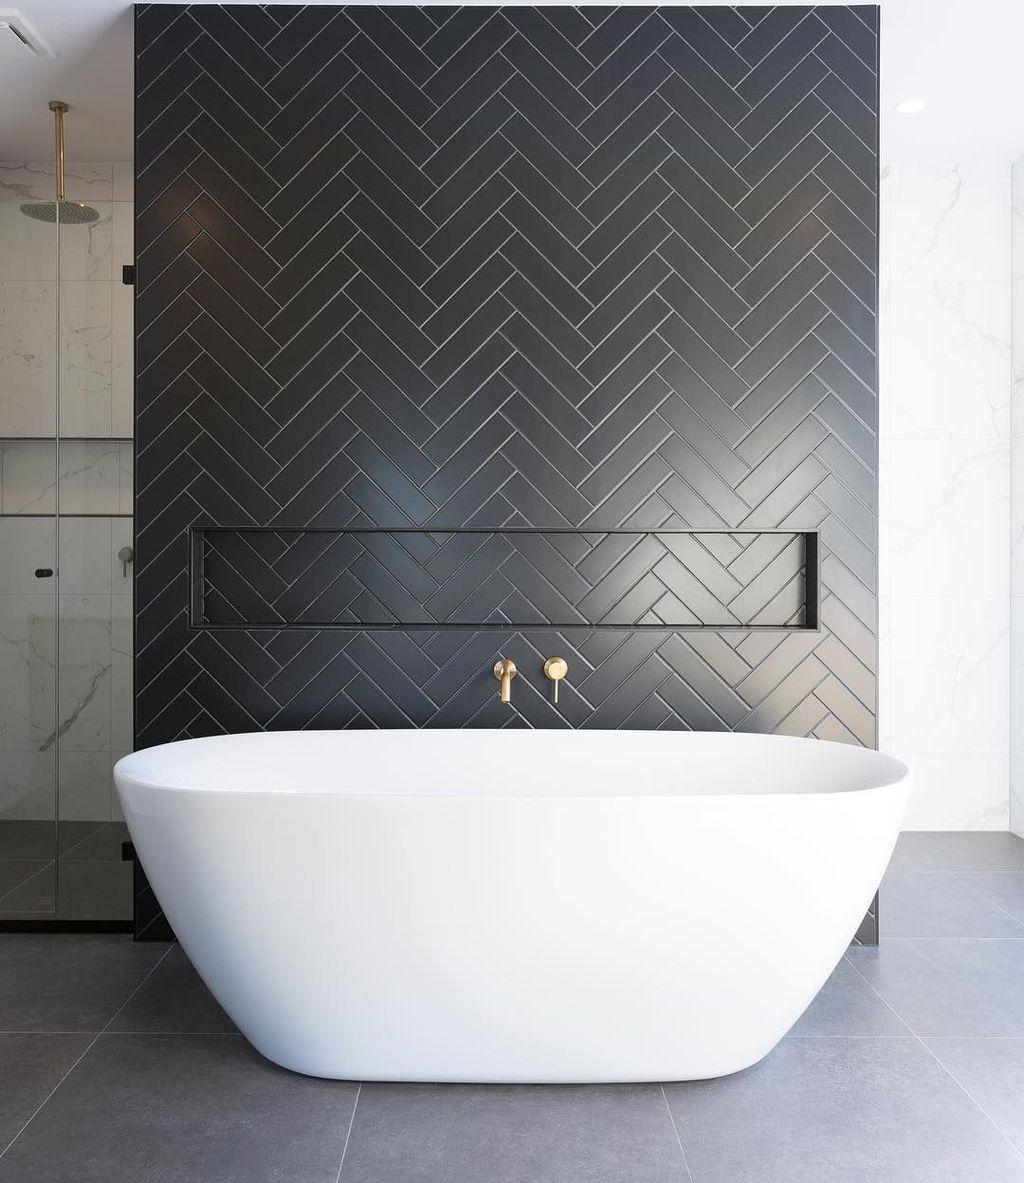 Amazing White Tile Bathroom Design Ideas Looks Elegant 25